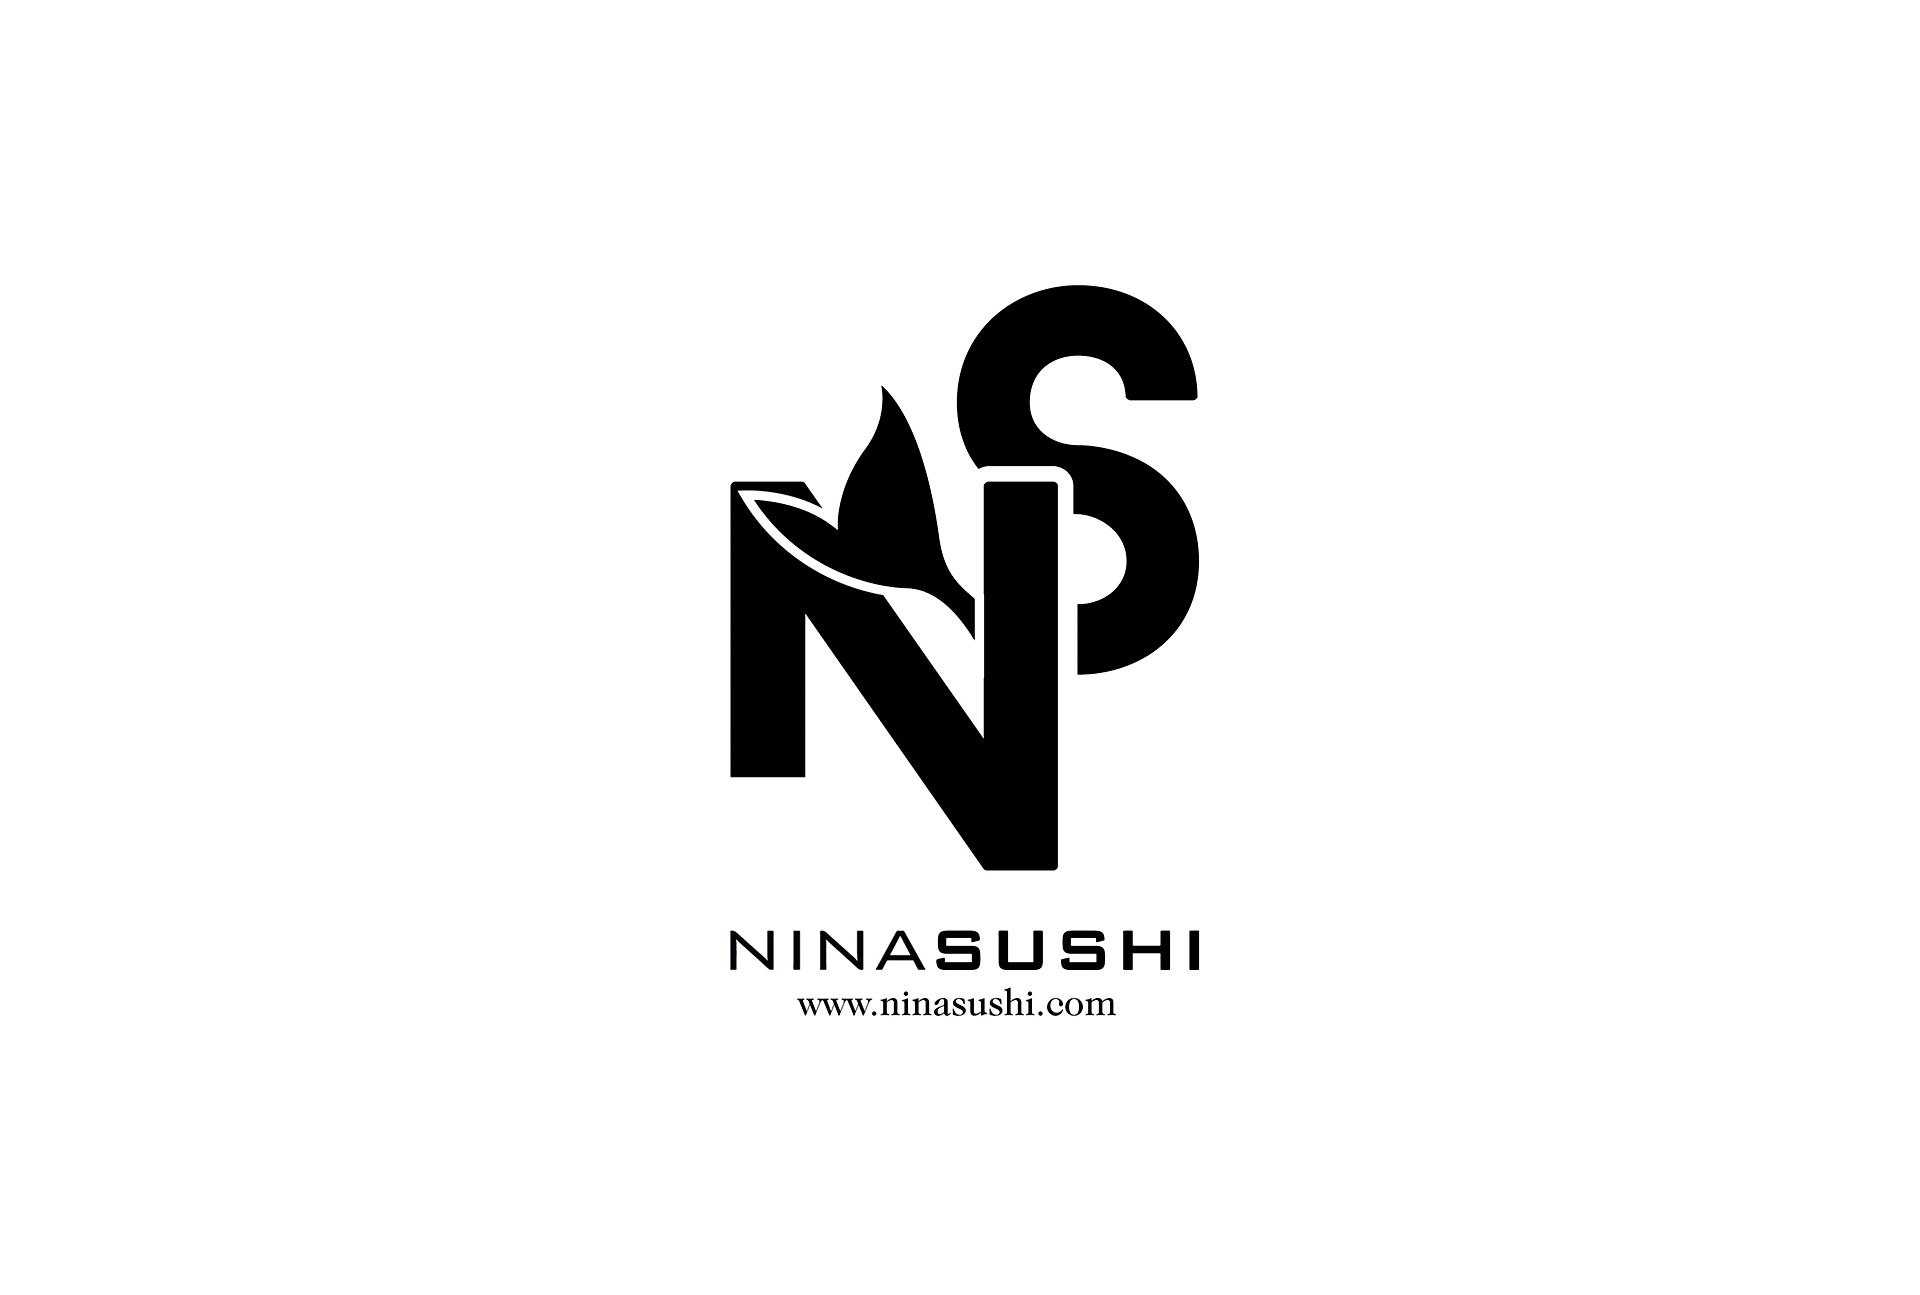 NINA SUSHI